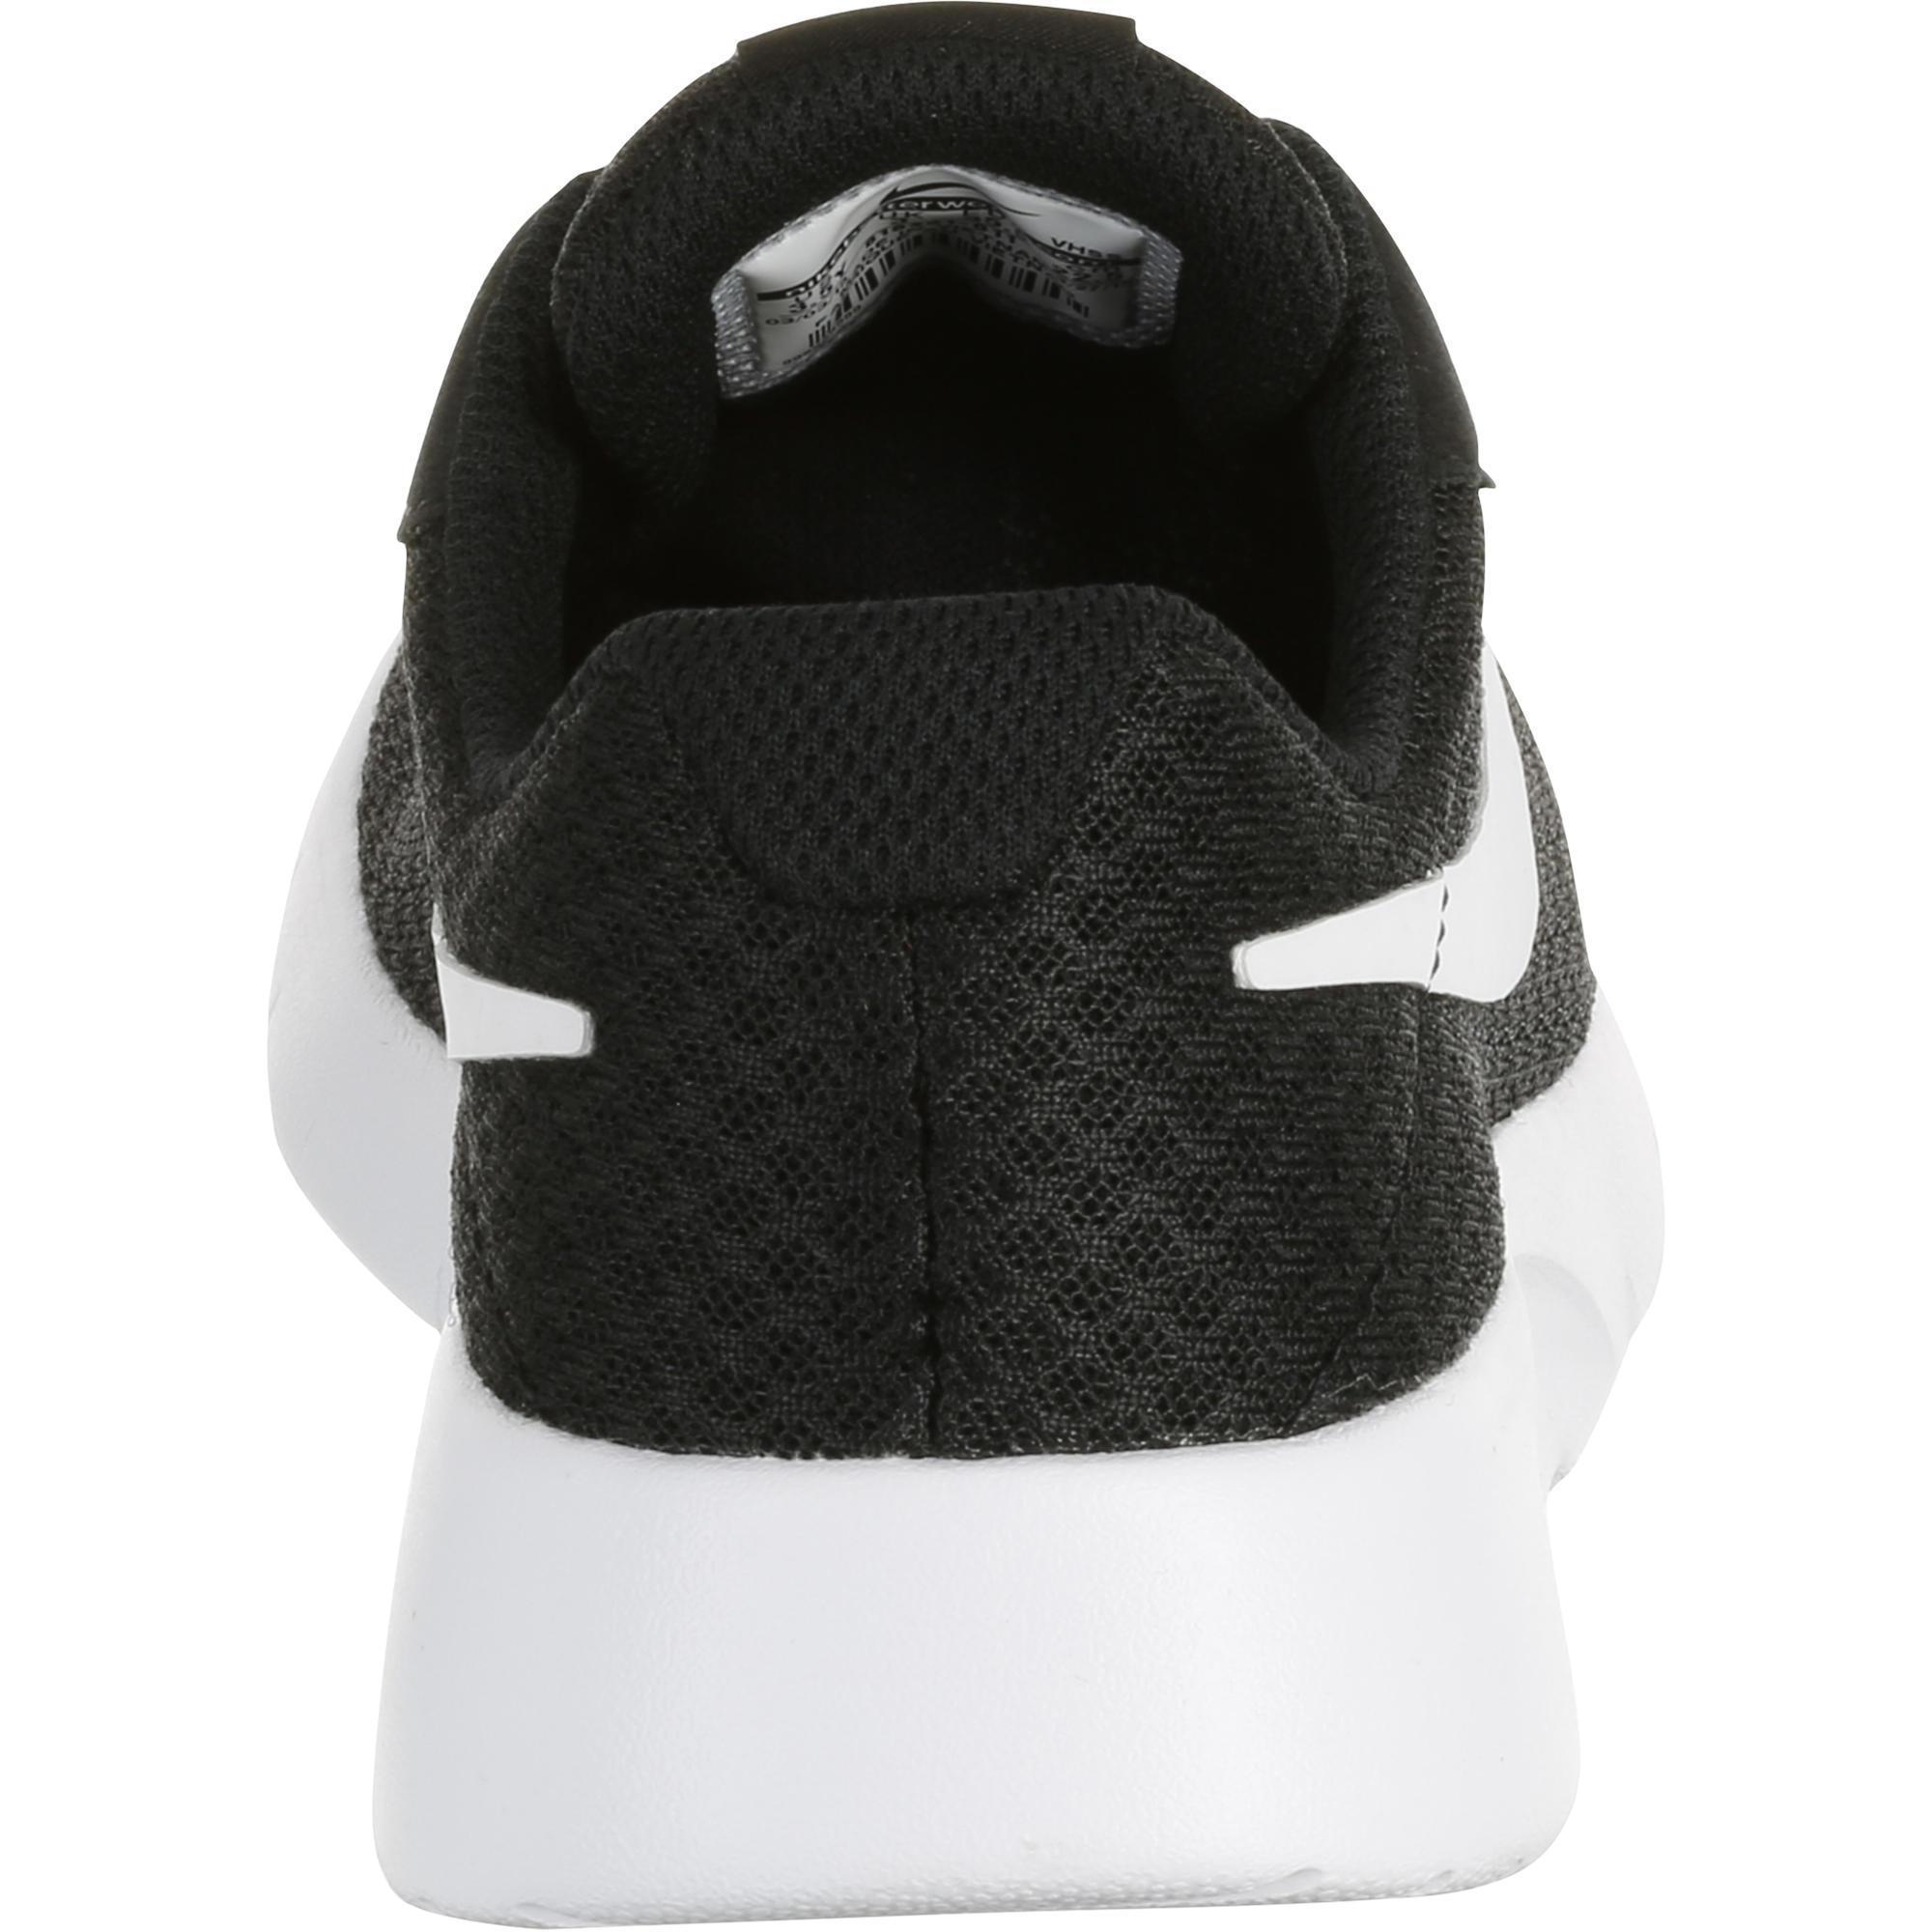 new style 51288 20c15 Blanc Sportive Tanjun Decathlon Noir Nike Chaussures Enfant Marche gwHYqE